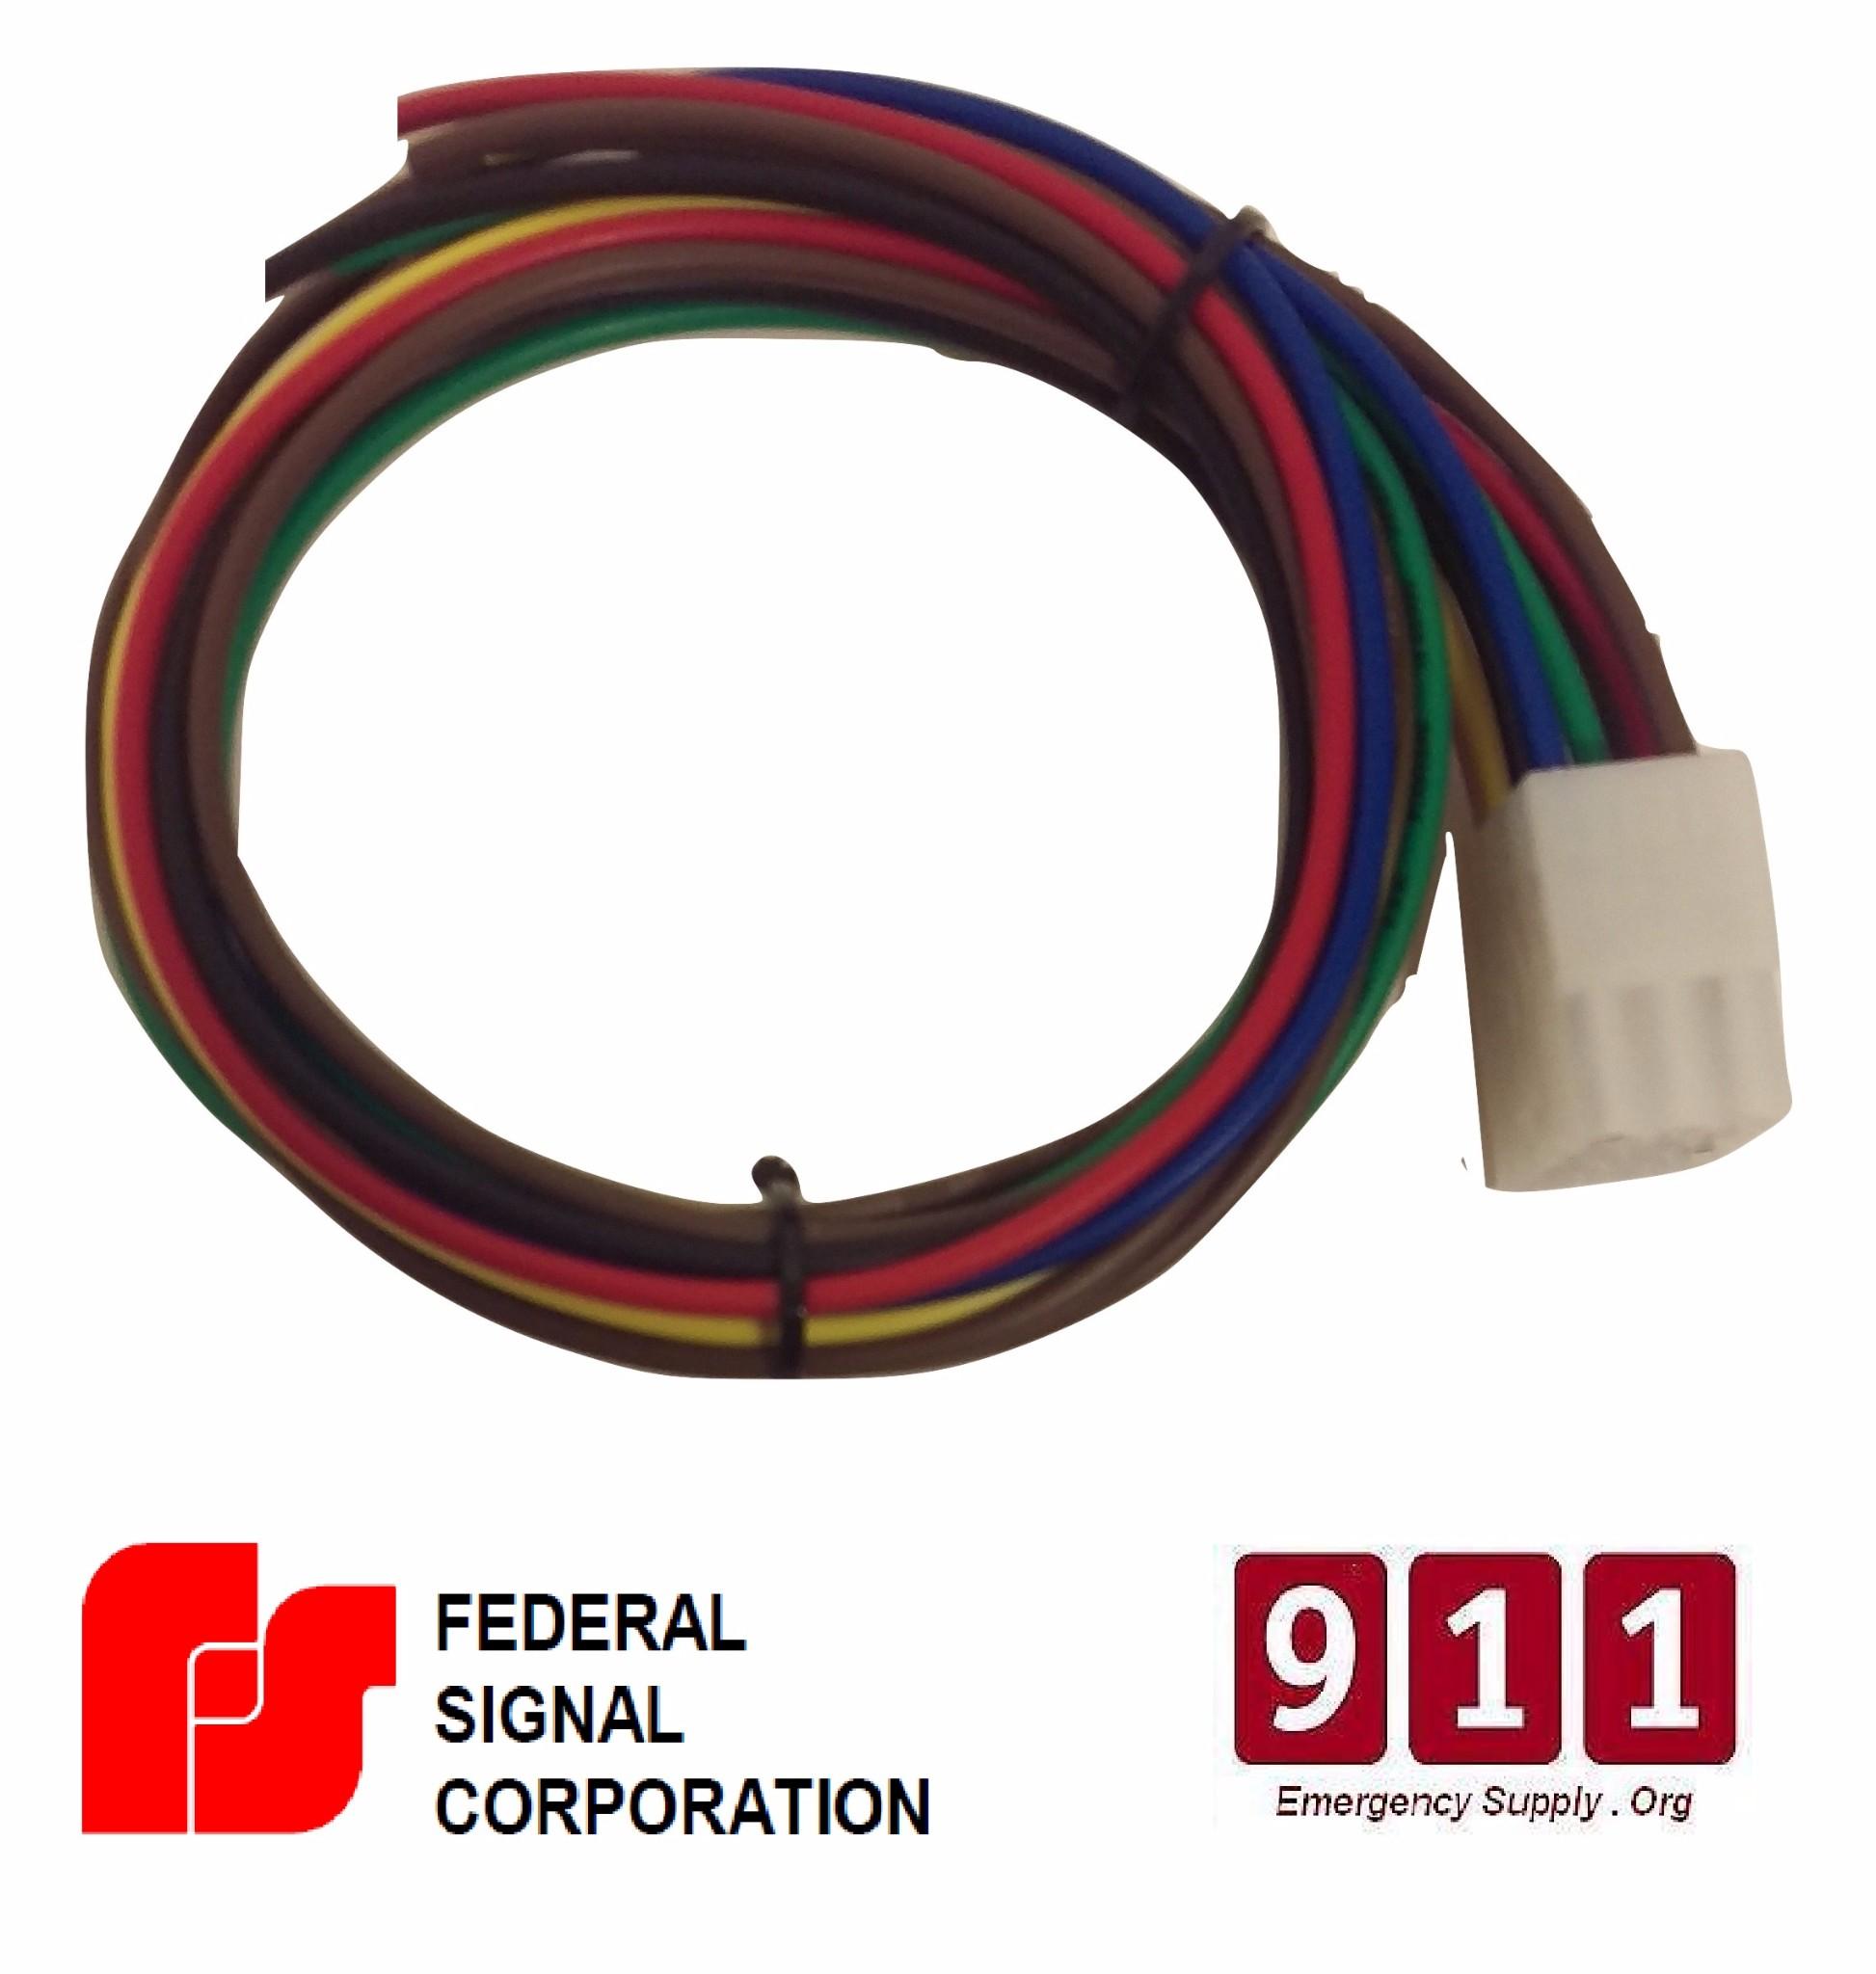 Pa 300 Siren Wiring Chart - All Diagram Schematics Federal Signal Unitrol Touchmaster Wiring Diagram on